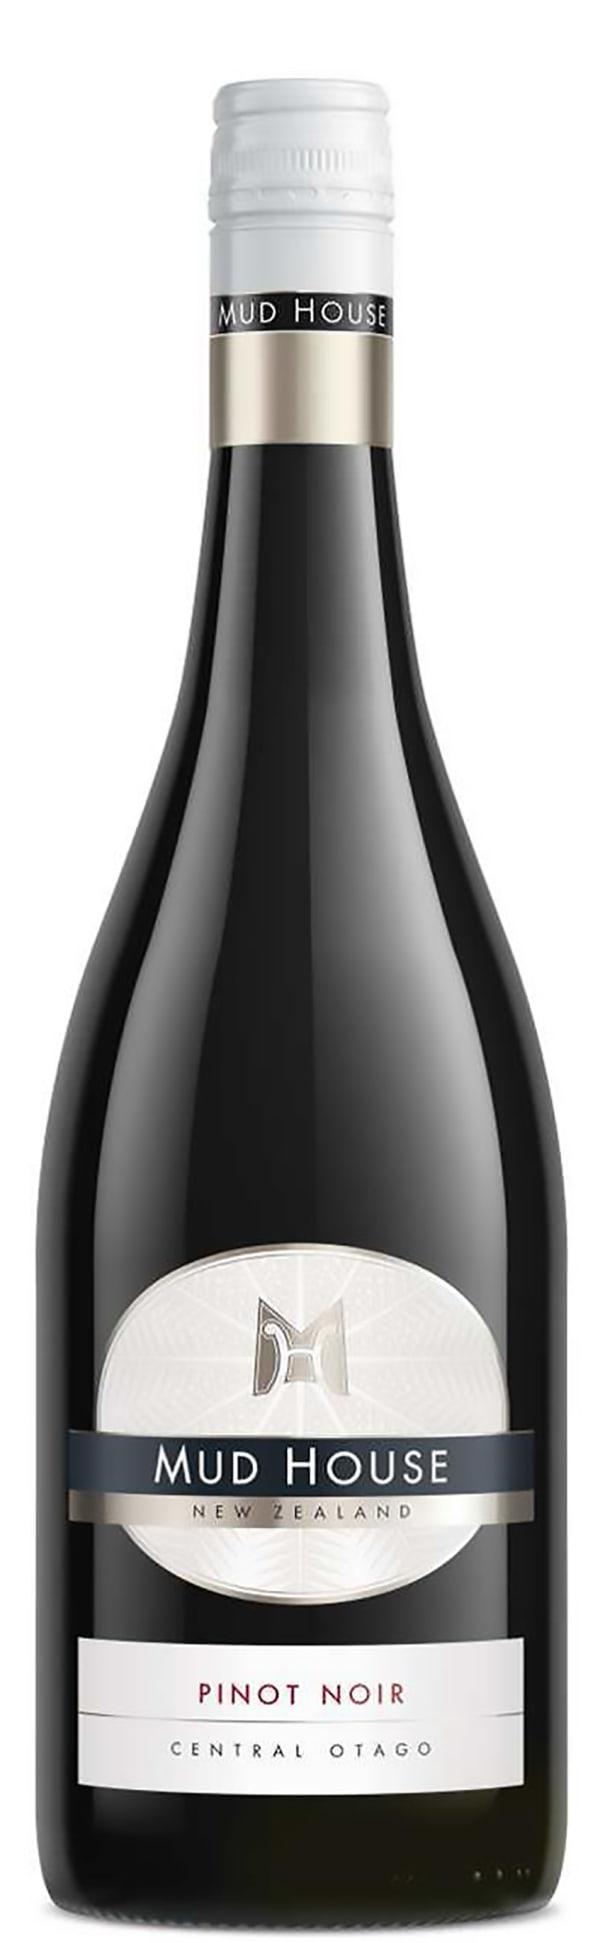 Mud House Central Otago Pinot Noir 2016